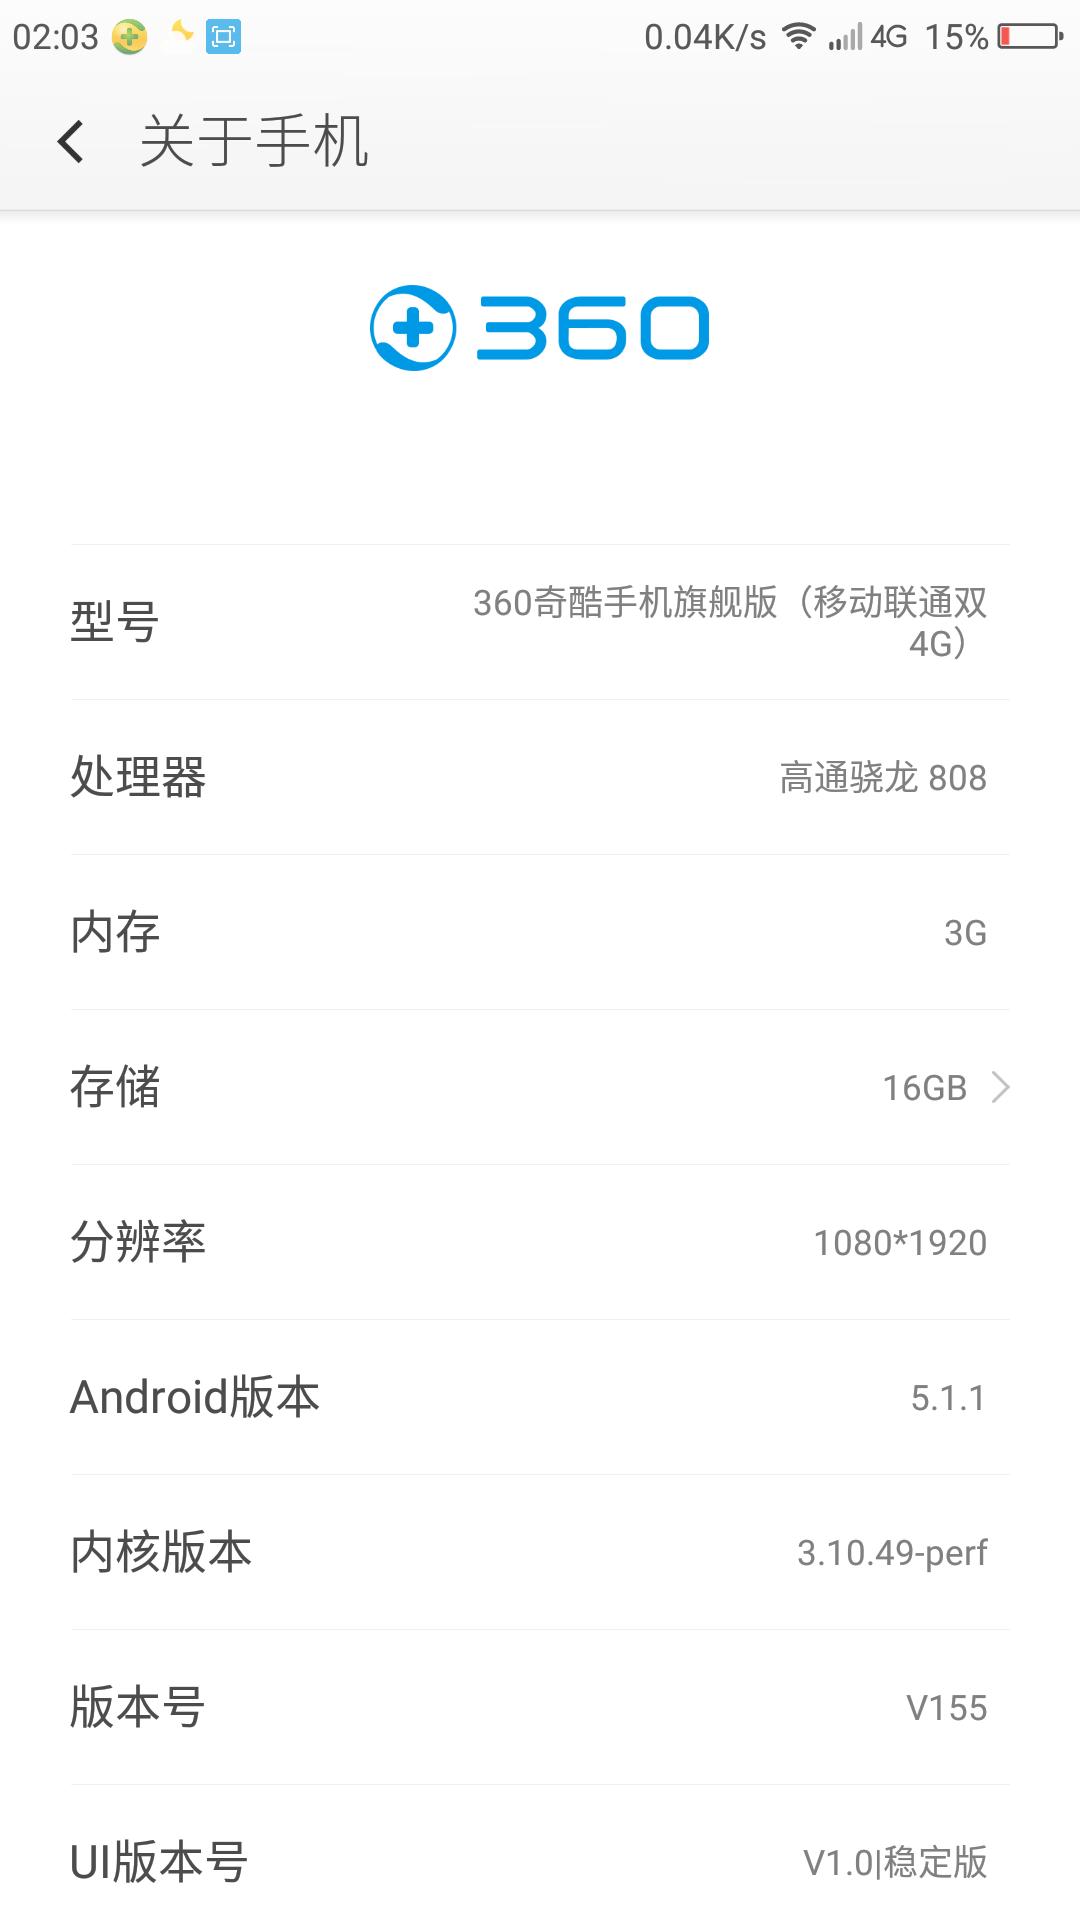 Screenshot_2019-04-06-02-03-58.png